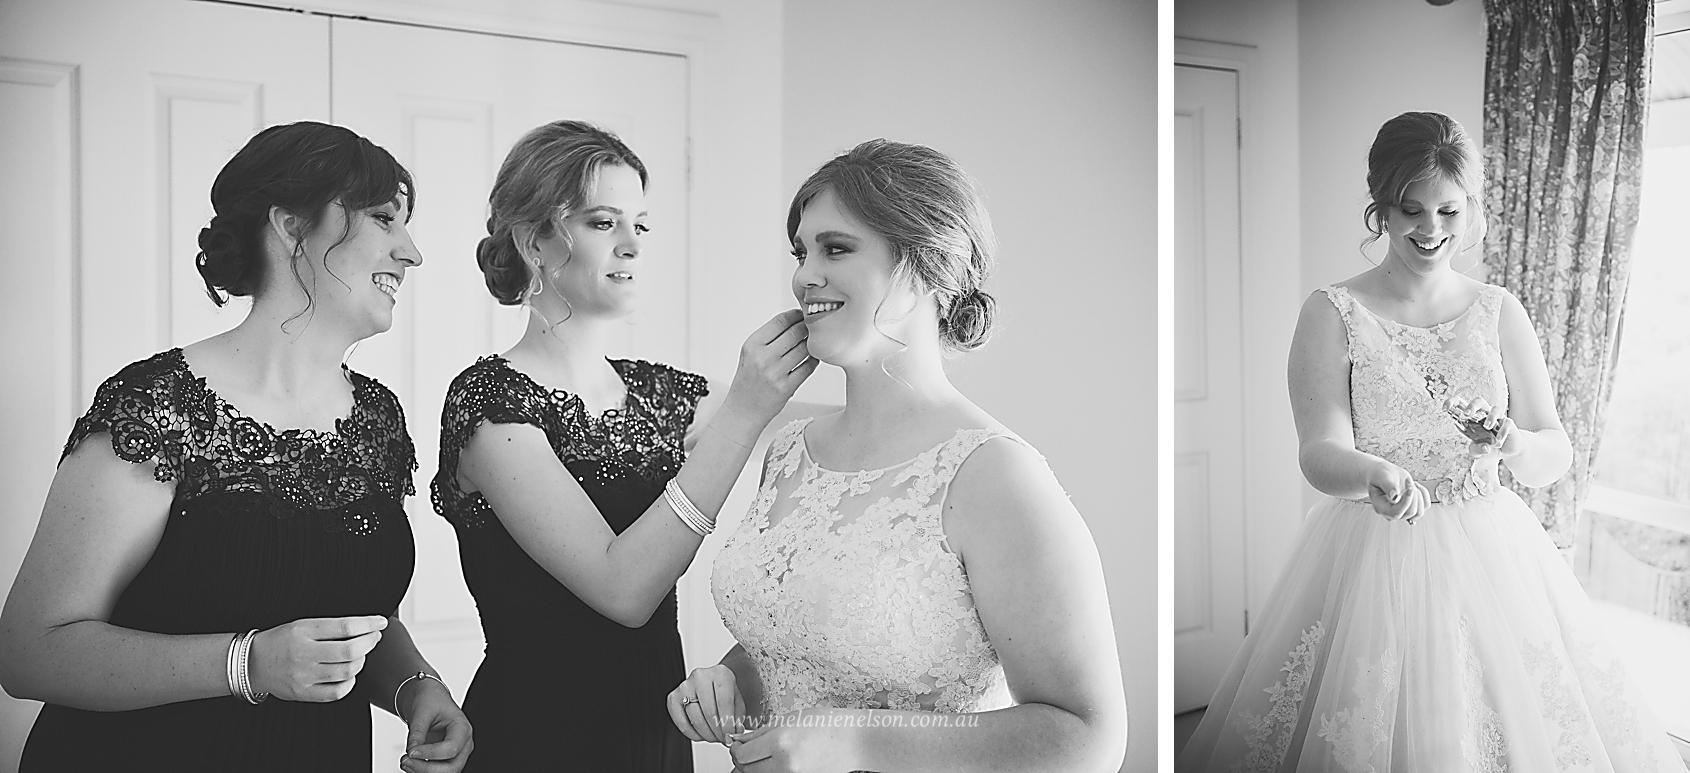 yorke_peninsula_wedding_photographer_0003.jpg